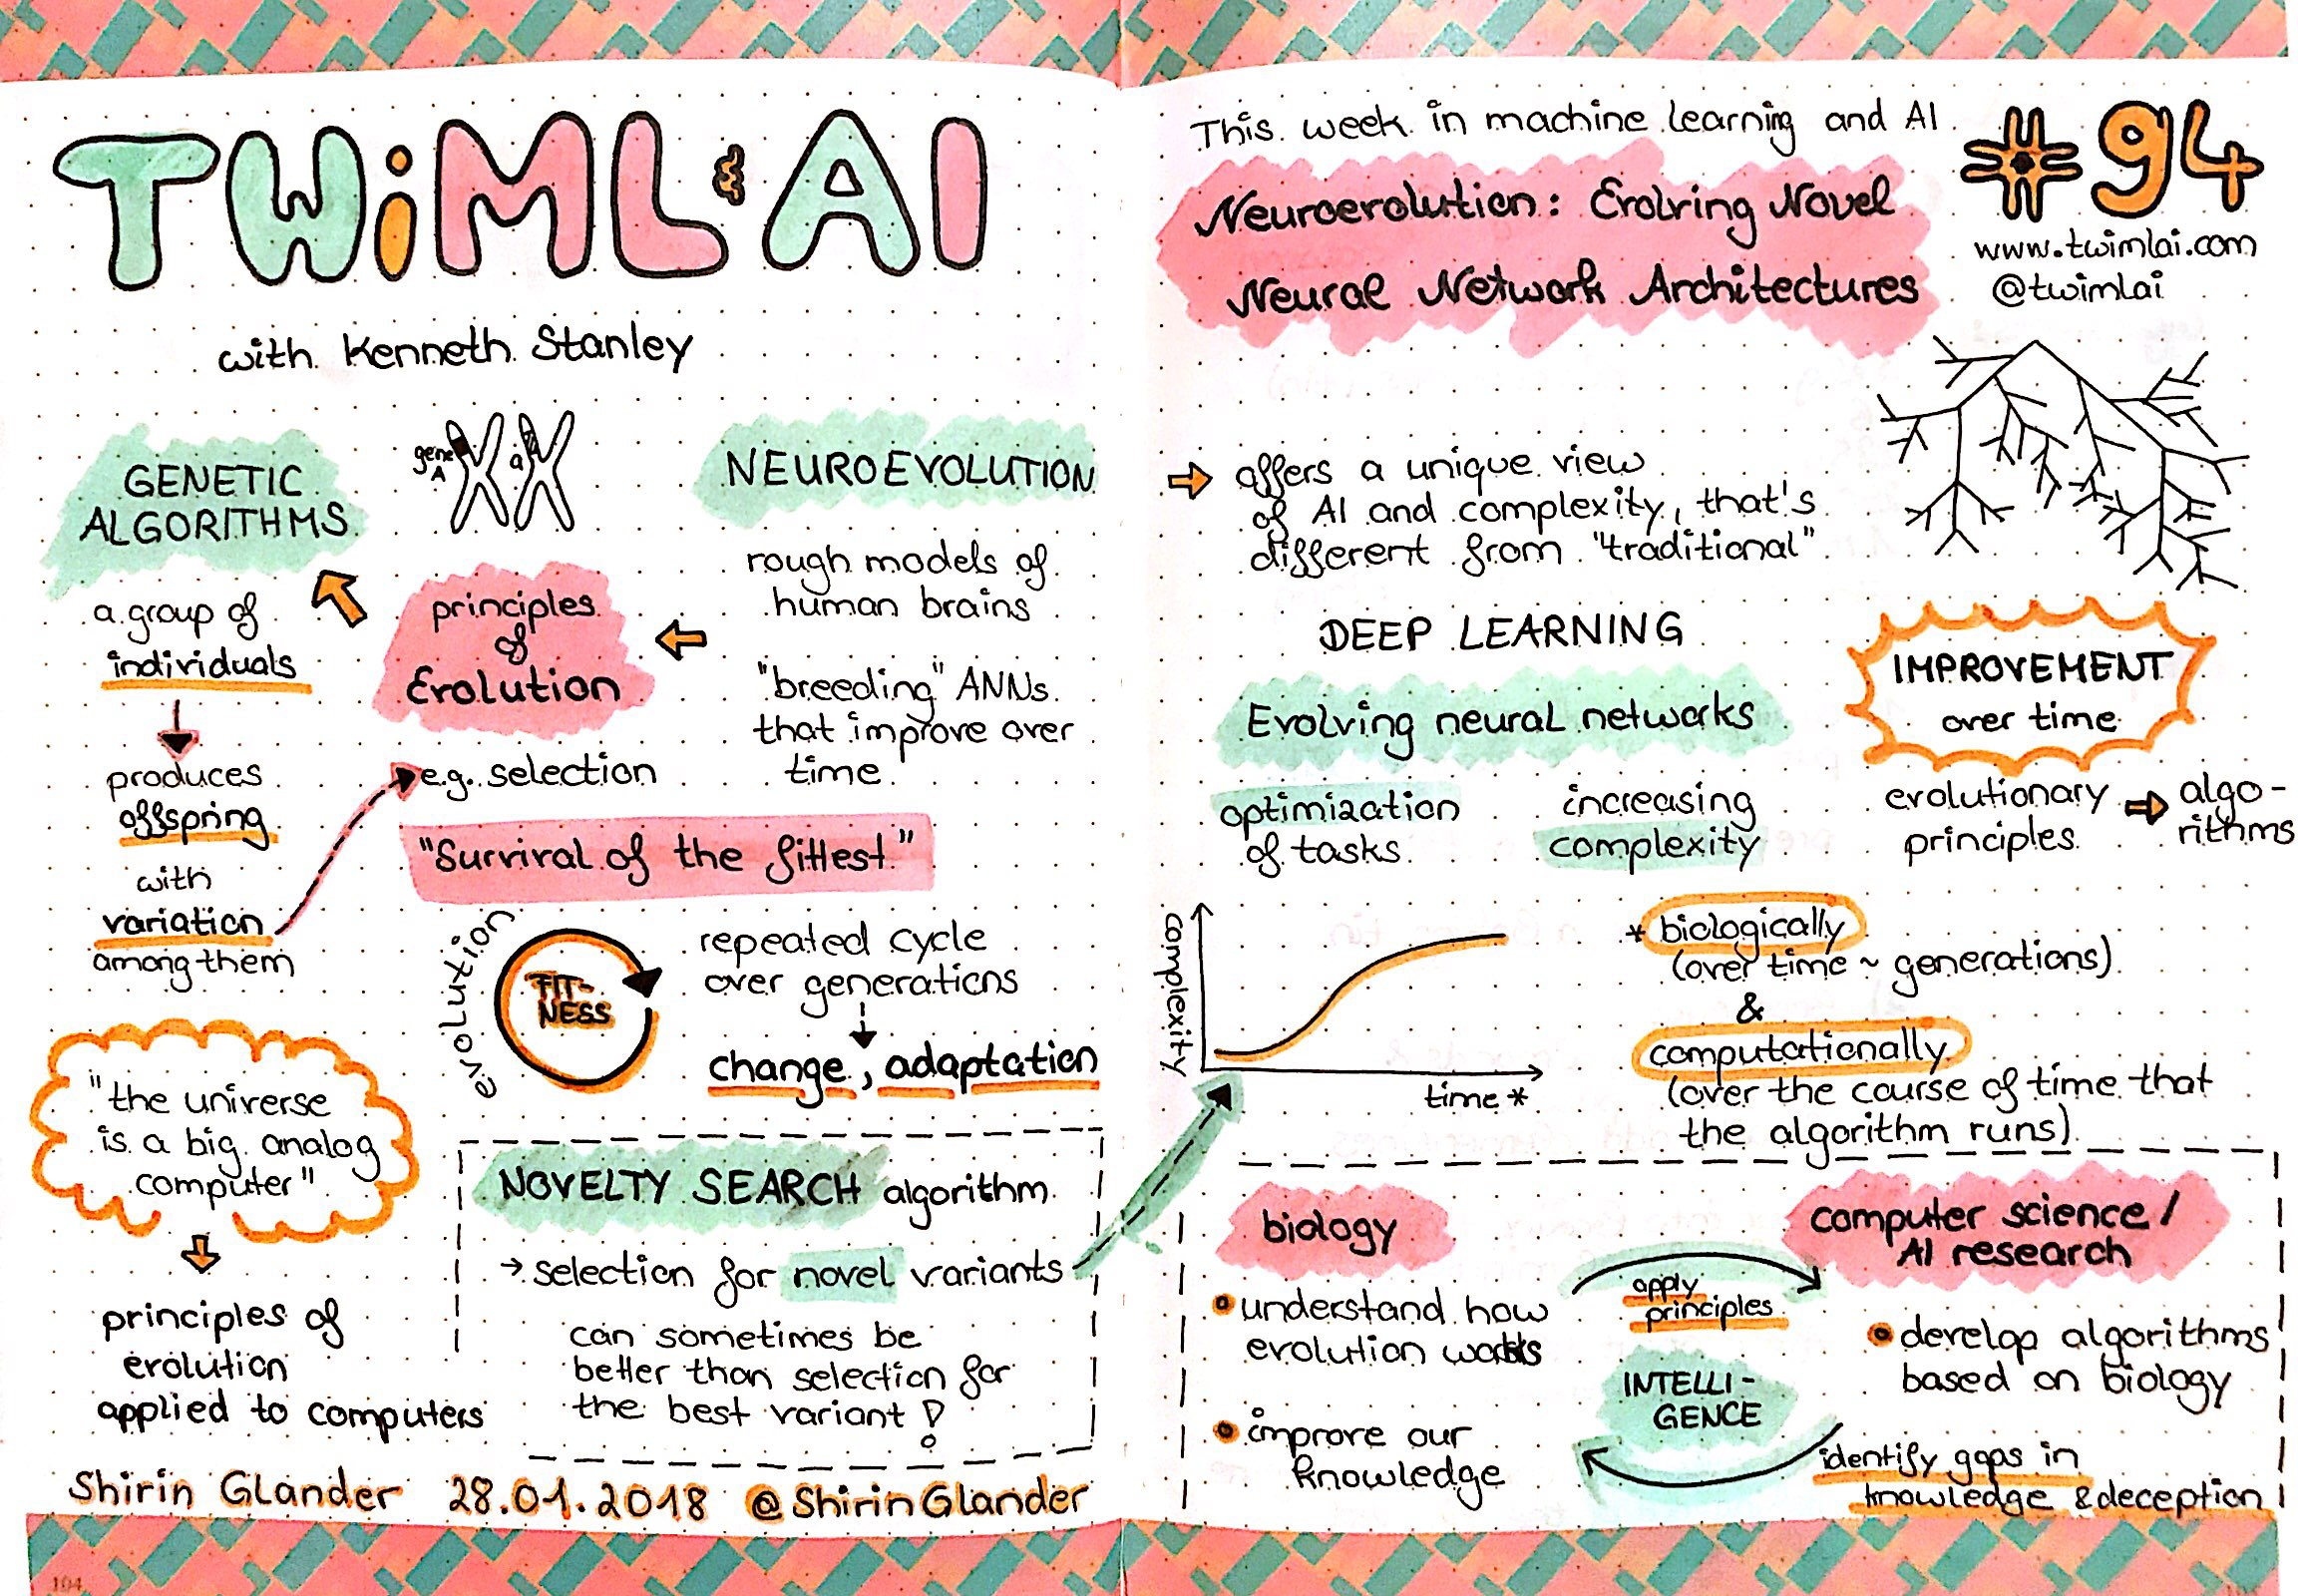 Sketchnotes From Twiml Amp Ai 94 Neuroevolution Evolving